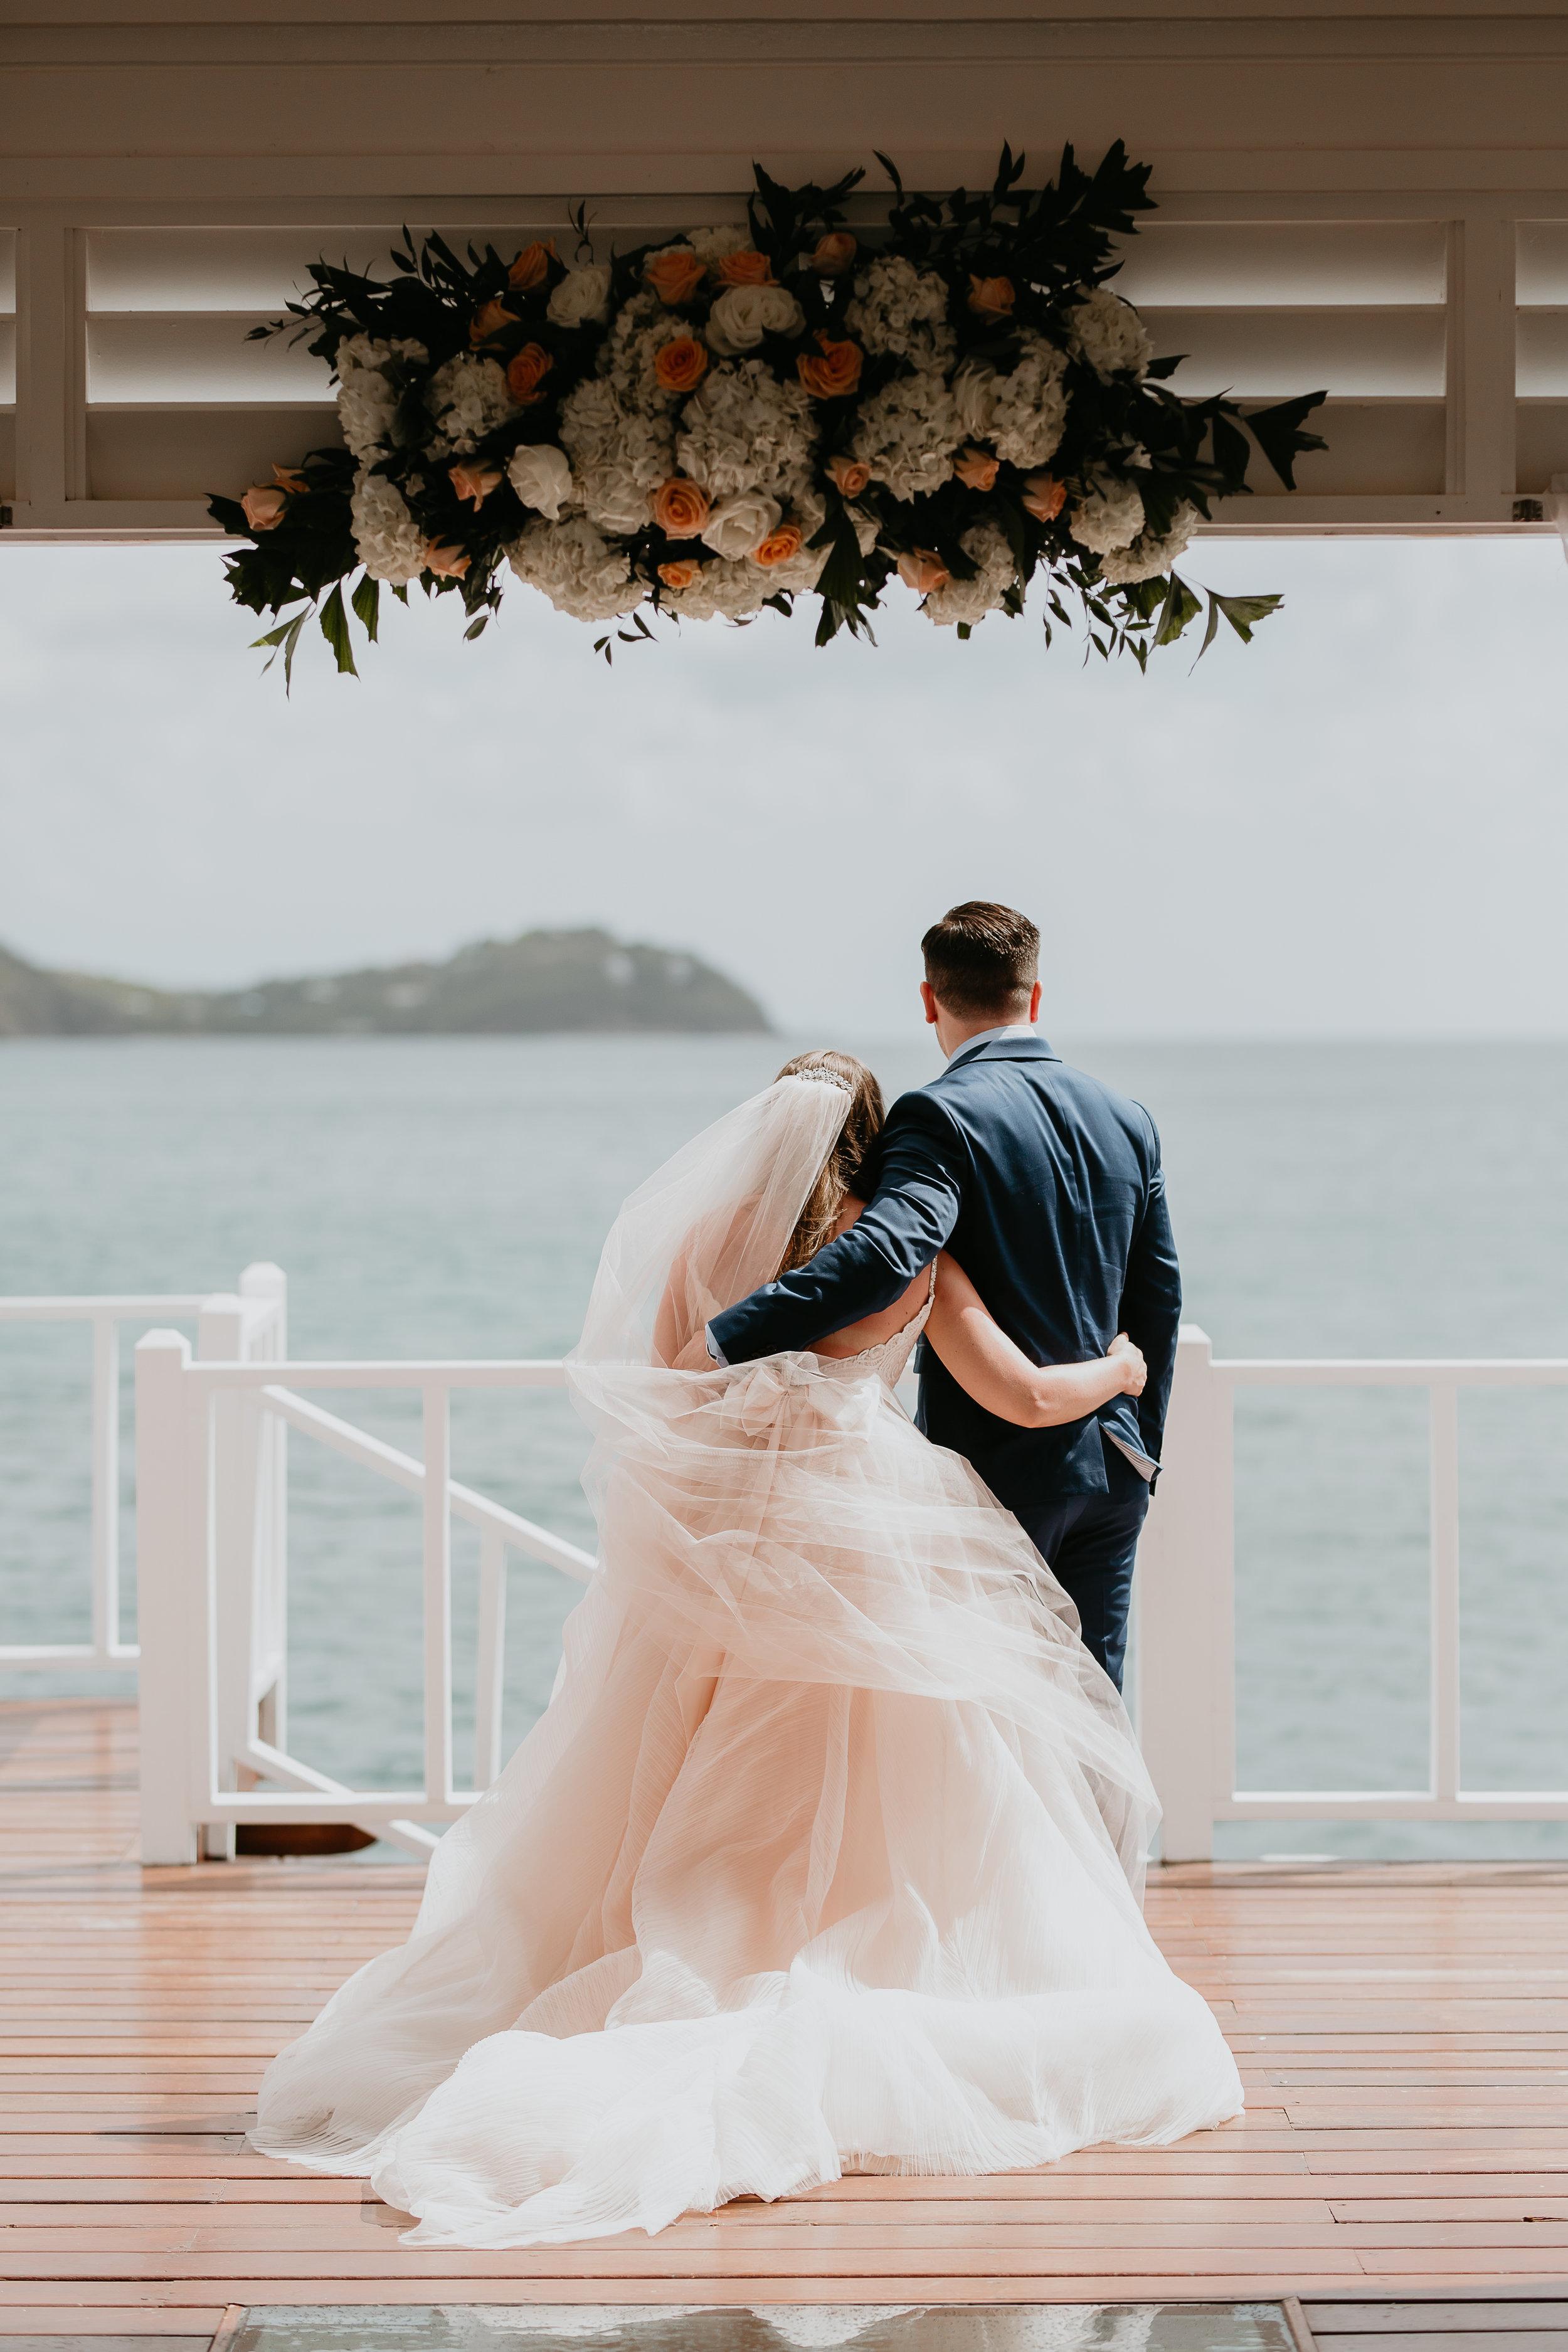 nicole-daacke-photography-destination-wedding-in-st-lucia-sandals-la-toc-intimate-island-wedding-carribean-elopement-photographer-chill-island-wedding-35.jpg